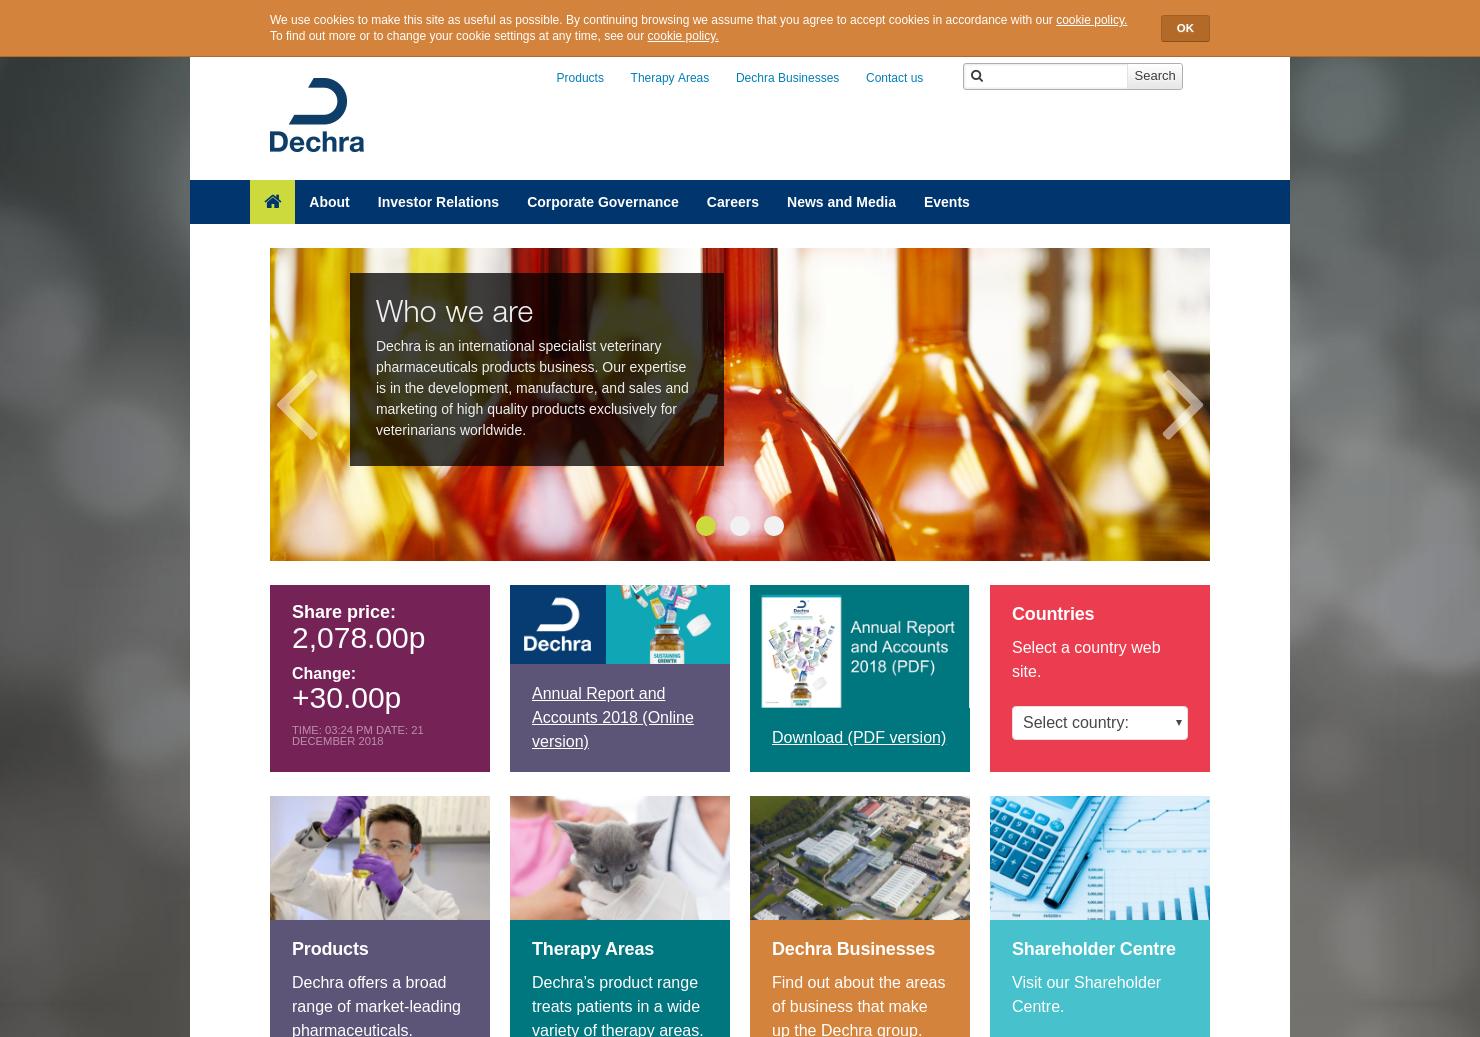 Dechra Home Page